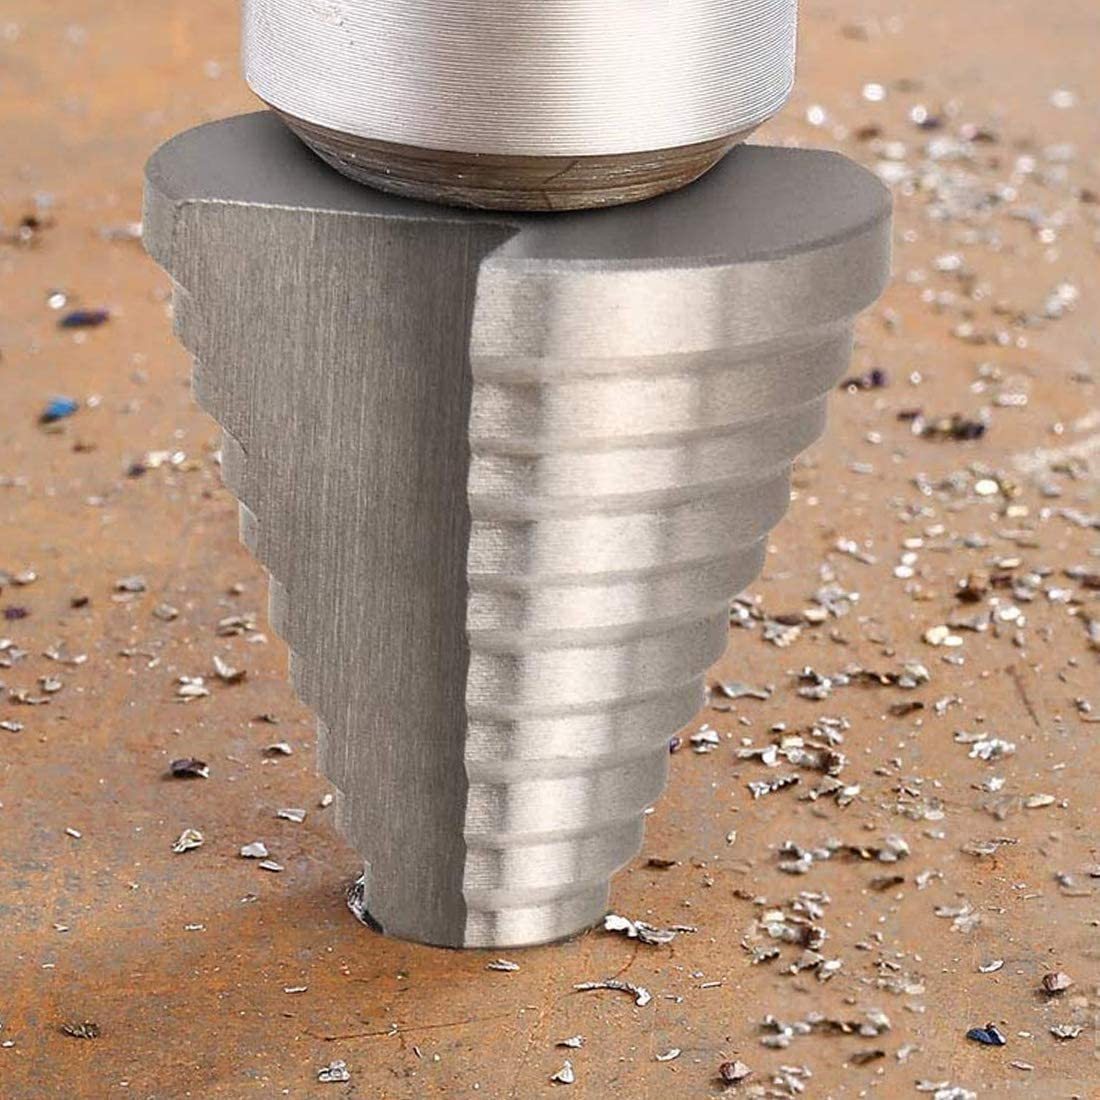 13 mm Schaft /Ø 5-35mm Stufenbohrer Sch/älbohrersatz f/ür Stahlblech bis 3mm dick oder Kunststoff//Metallblech f/ür Lochgr/ö/ße 5-35mm REYOK HSS Stufenbohrer